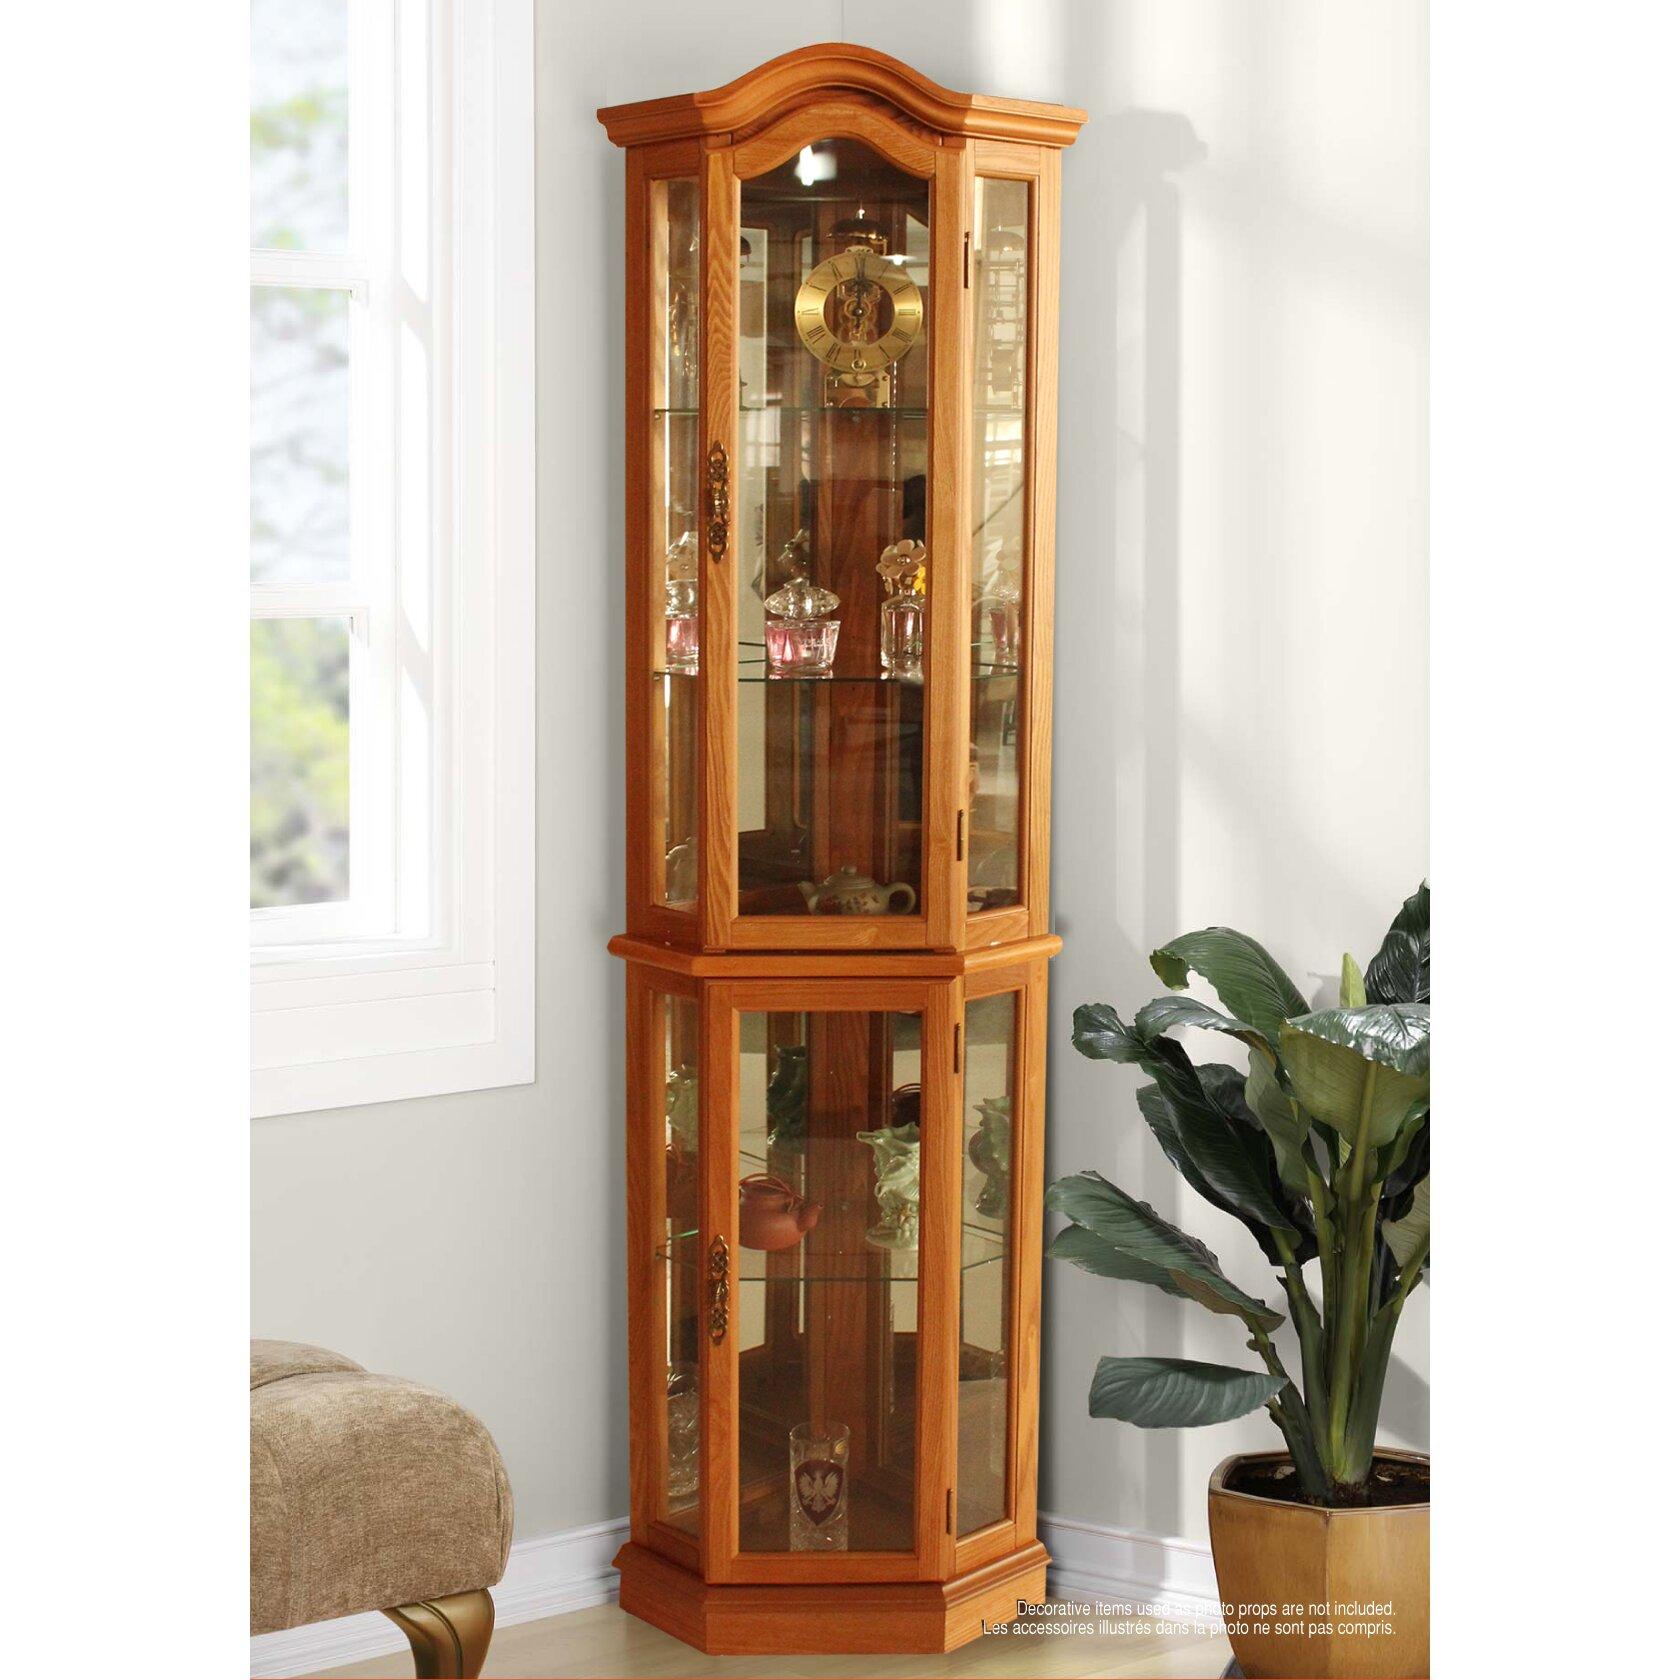 Jenlea curio cabinet reviews wayfair for Wayfair kitchen cabinets